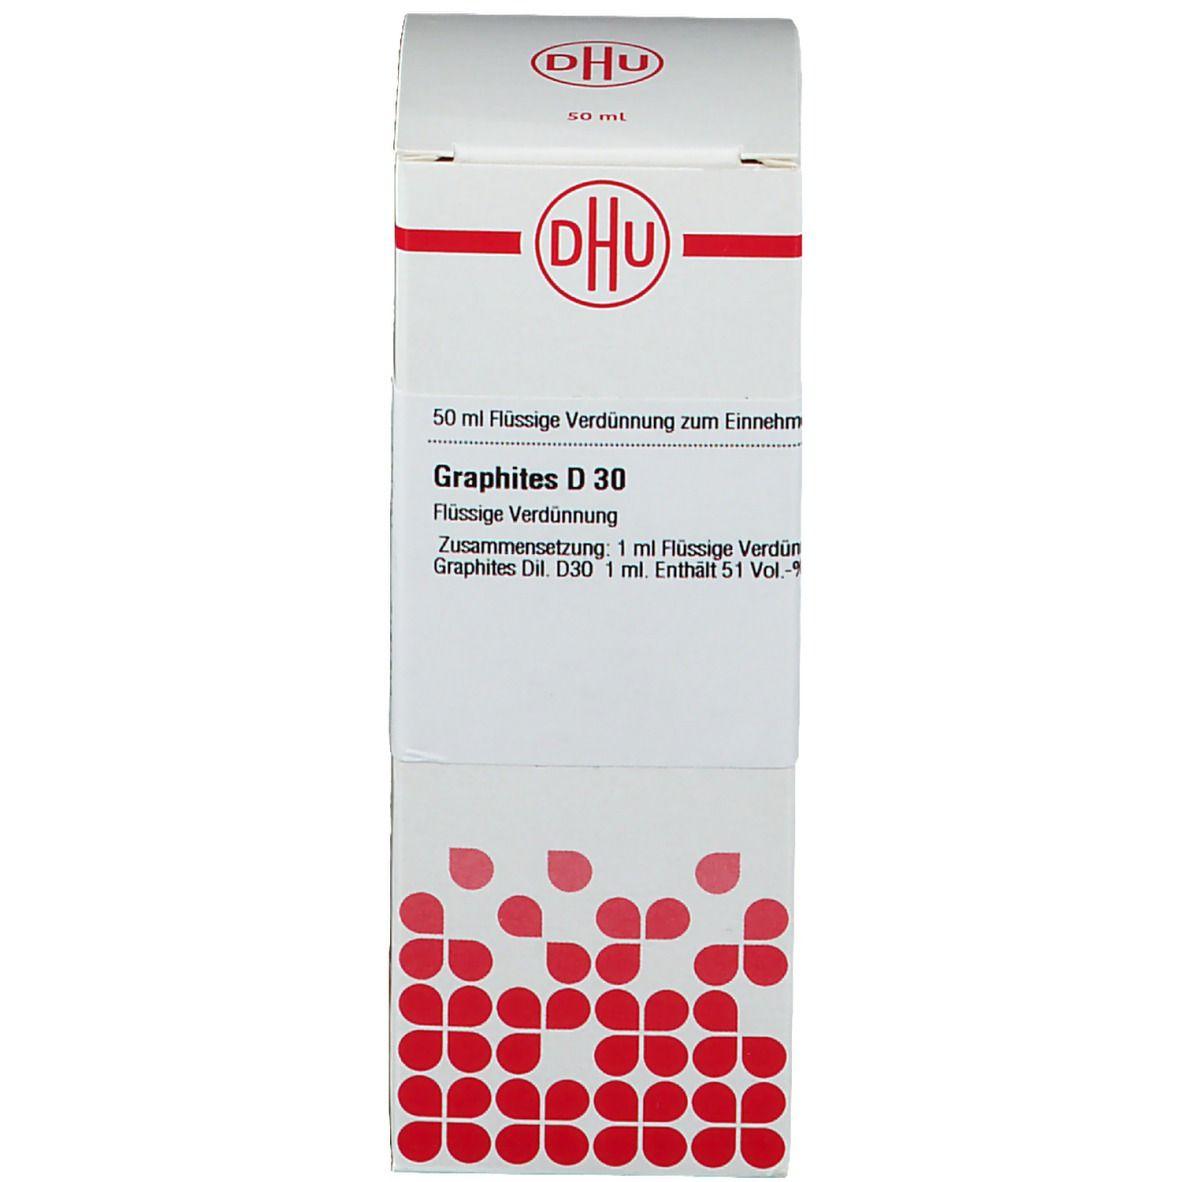 DHU Graphites D30